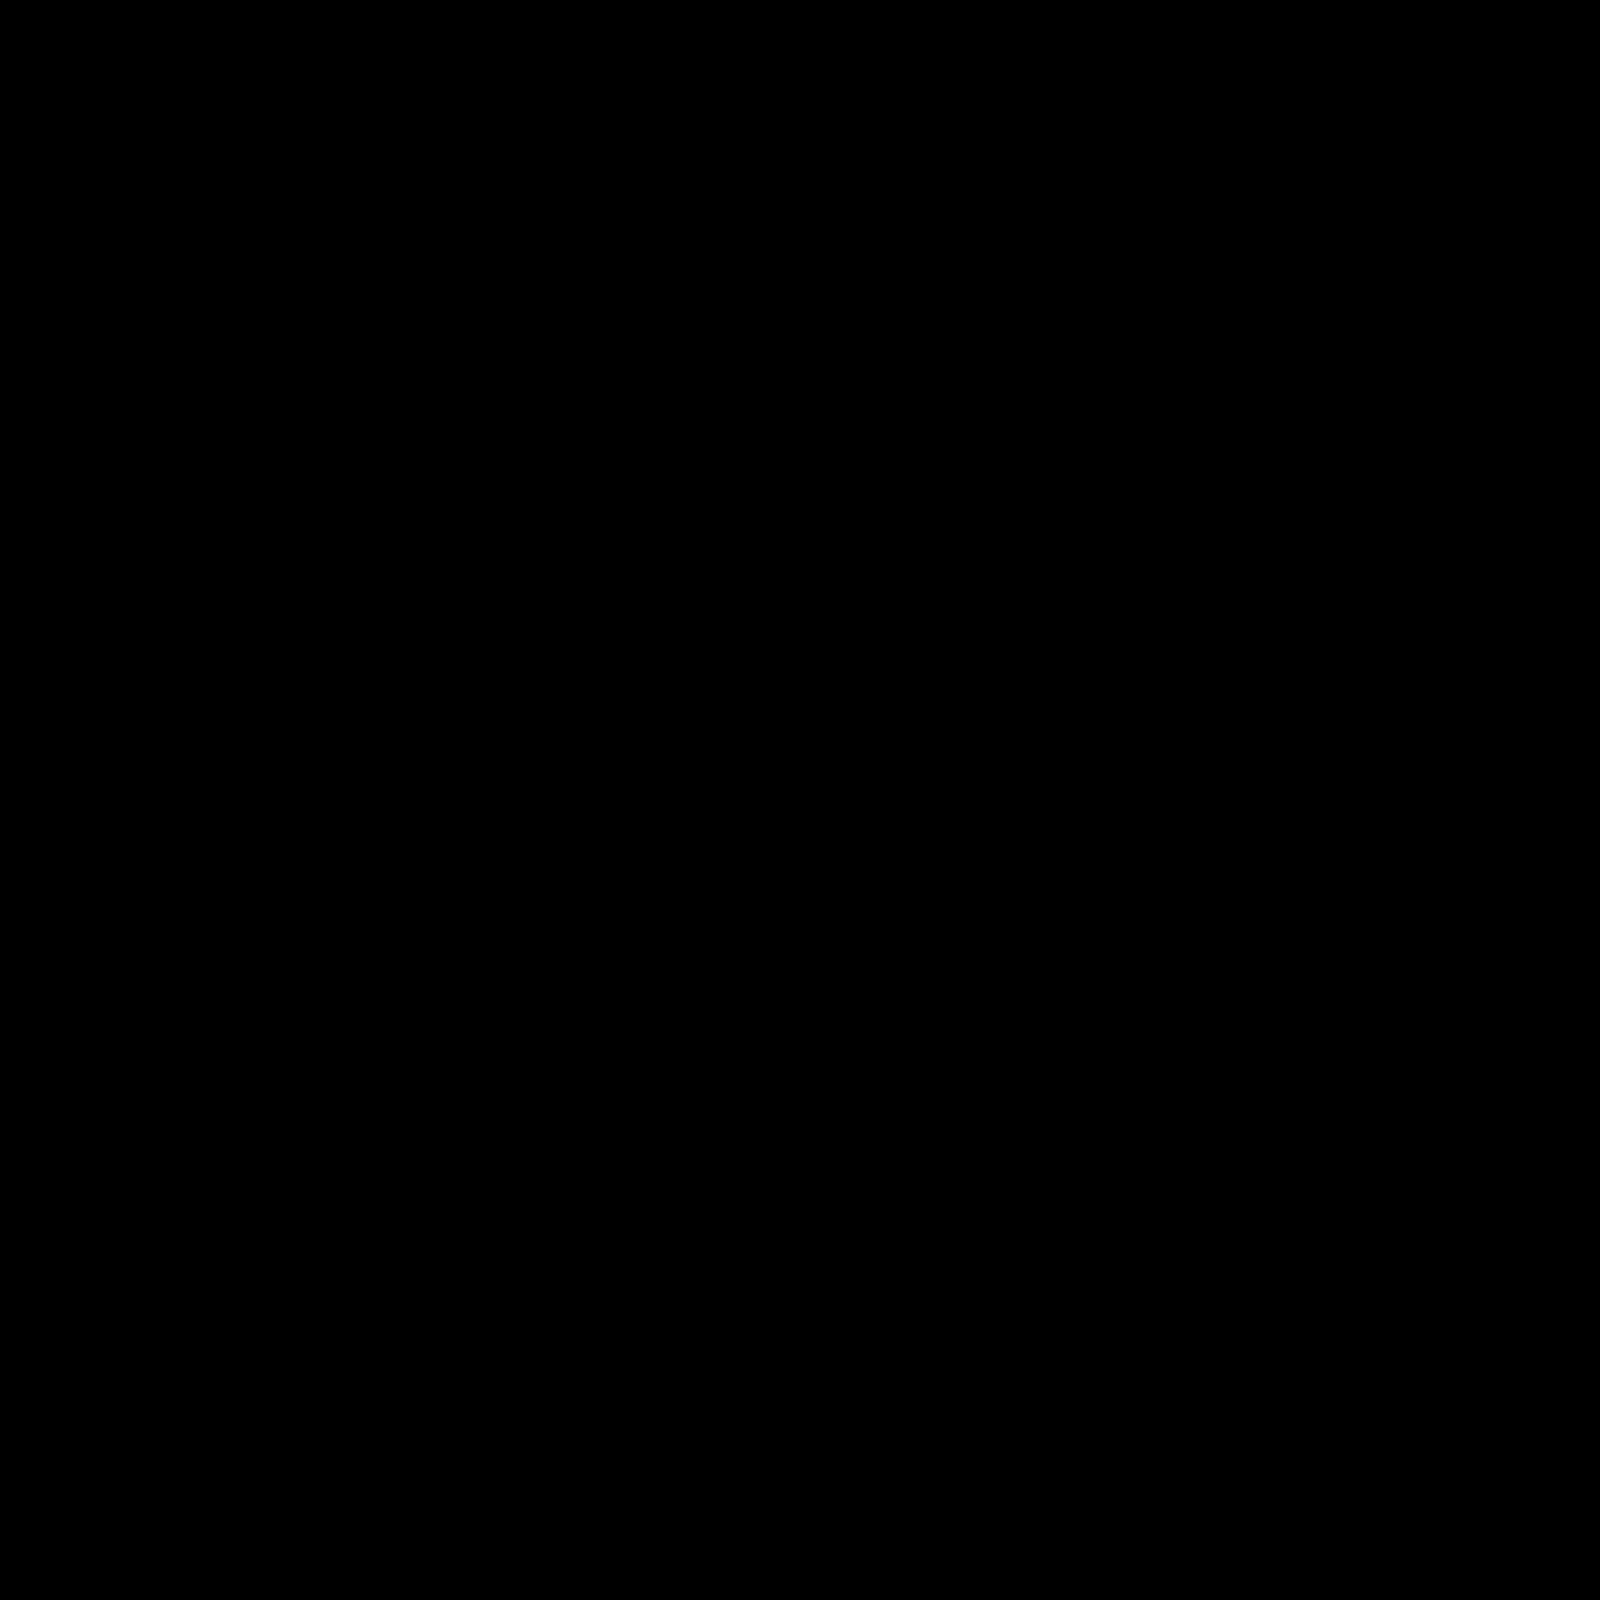 Oak silhouette clip art. Tree icon png